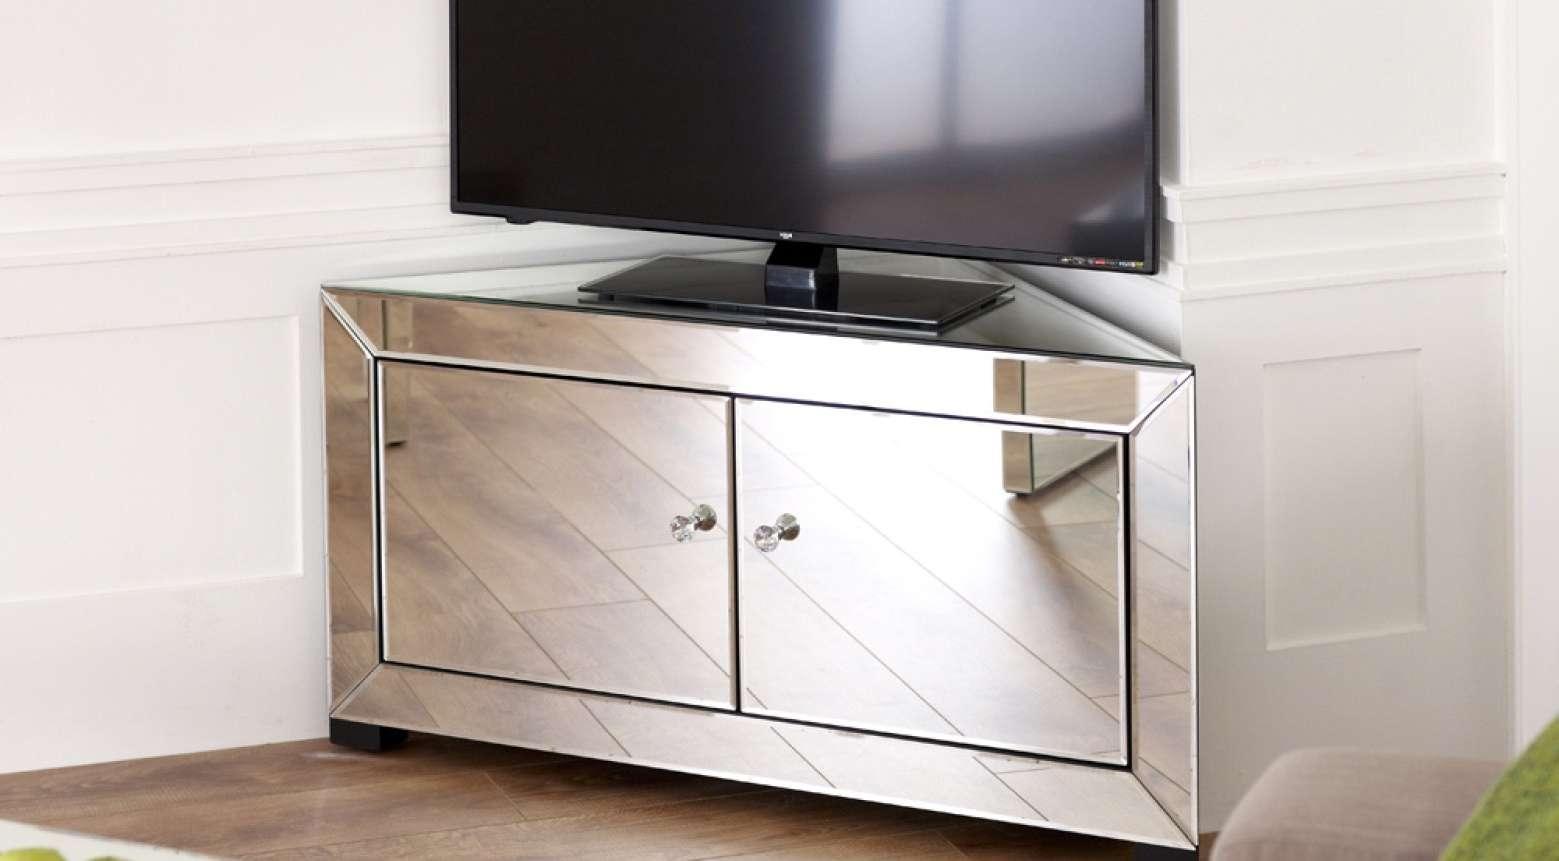 Mirror : Mirrored Console Cabinet Beautiful Mirrored Tv Cabinets For Mirrored Tv Cabinets (View 5 of 20)